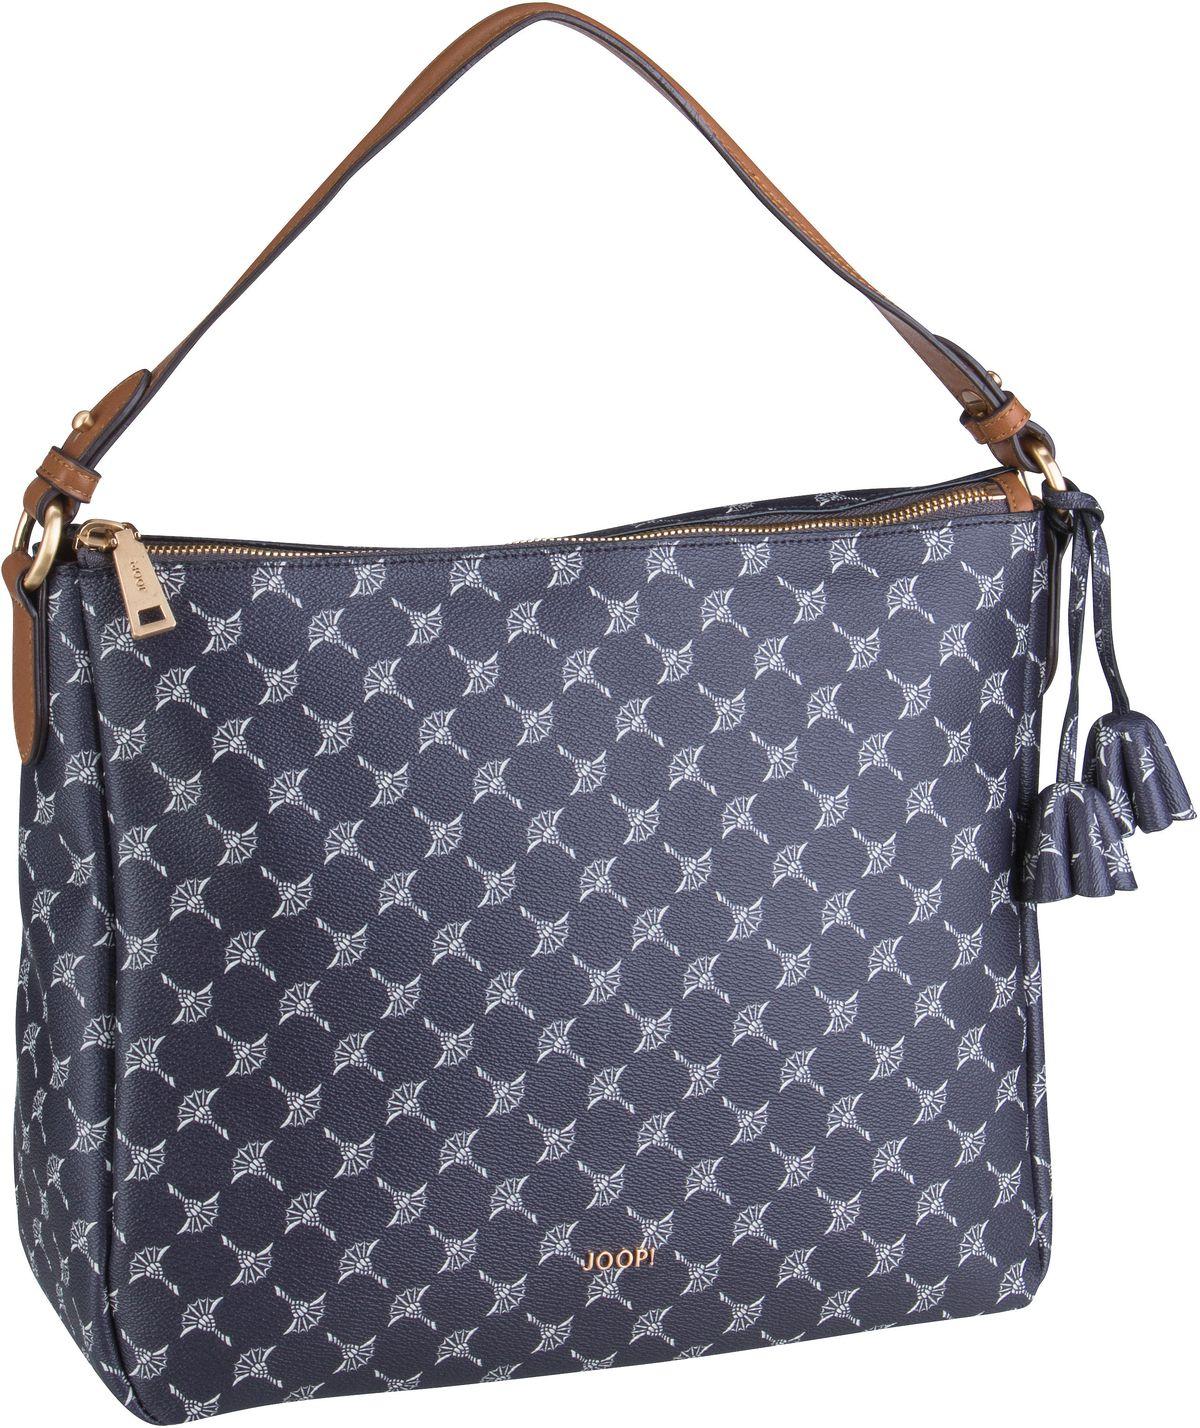 Handtasche Cortina Athina Hobo MHZ Nightblue